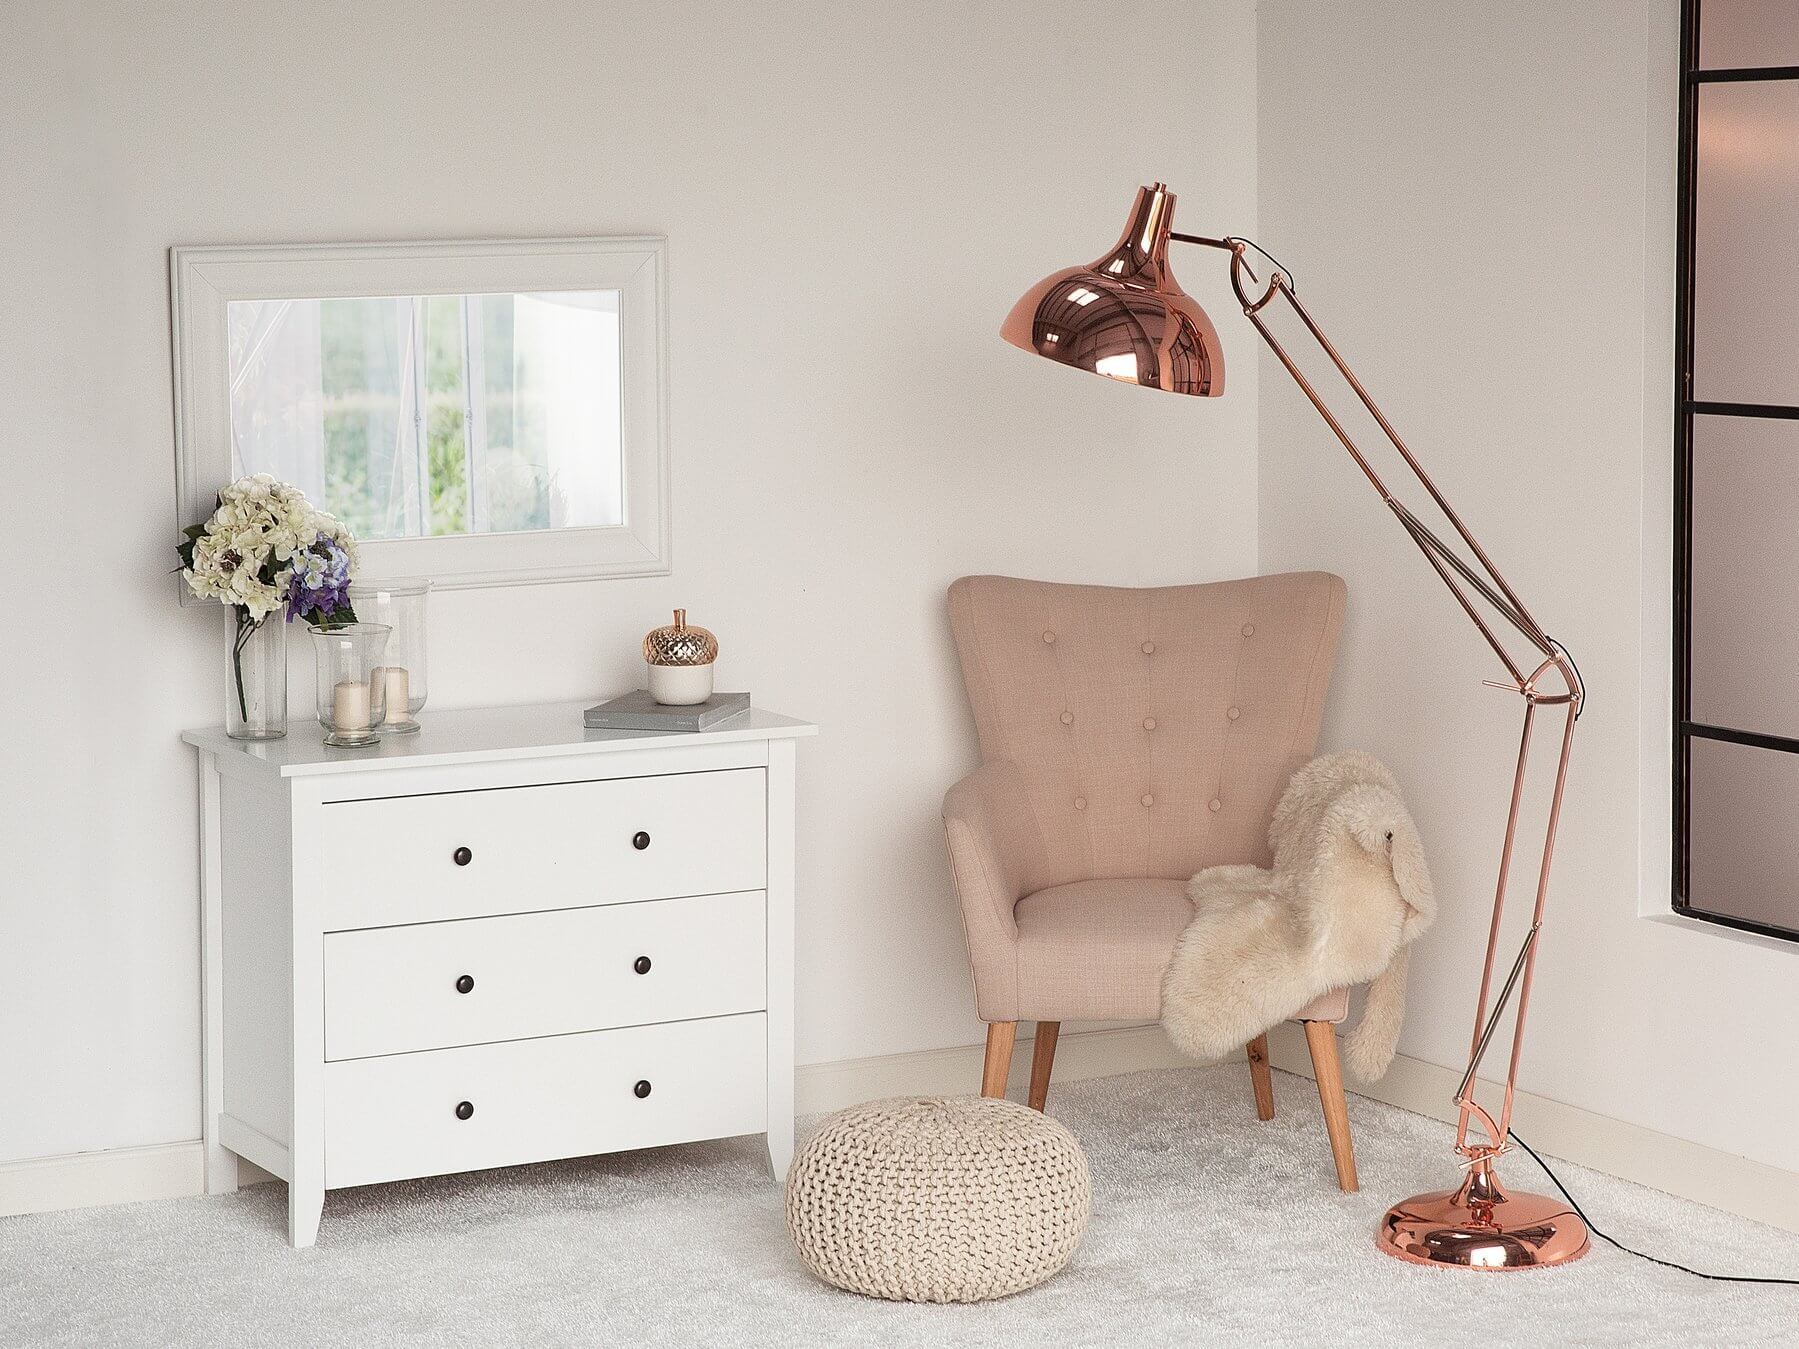 undef src sa picid 684002 x 1800 type color image - Kącik do czytania - jak wybrać fotel, lampę i regał?